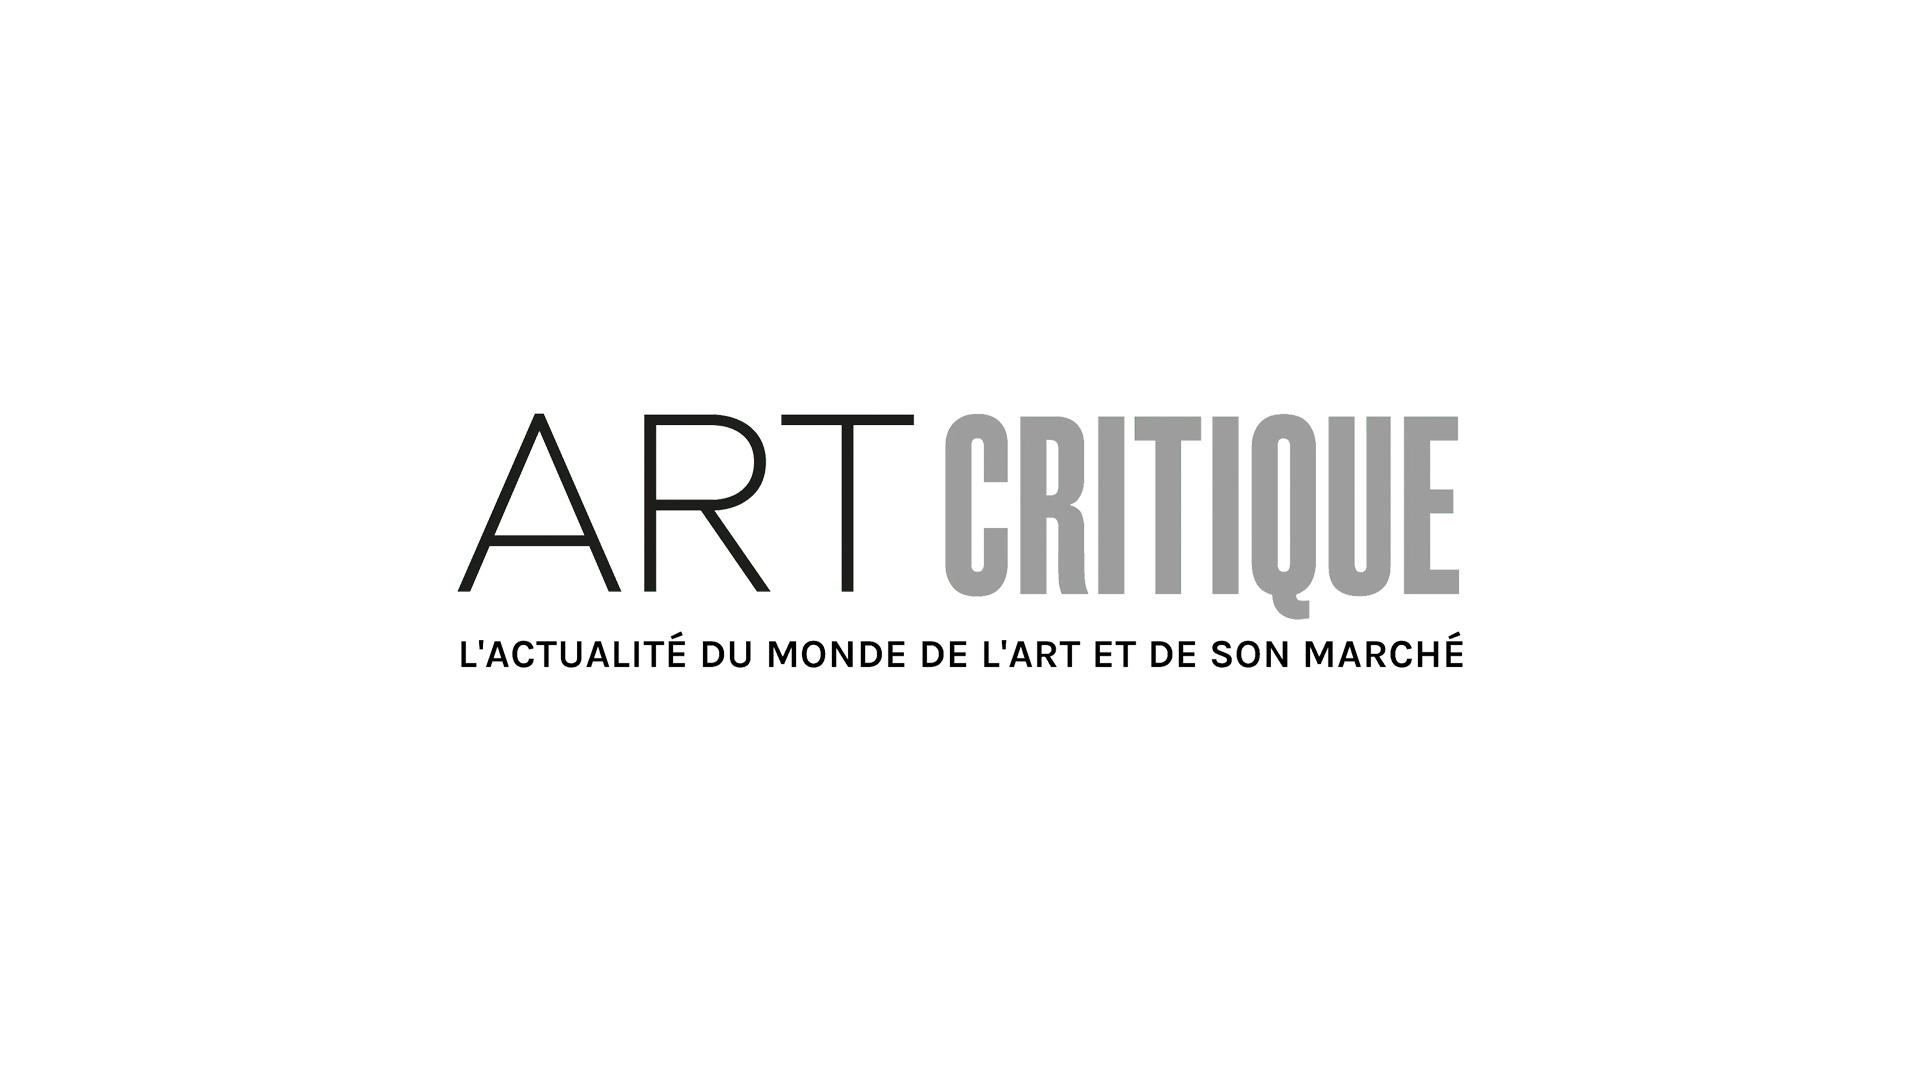 La critique selon Clement Greenberg